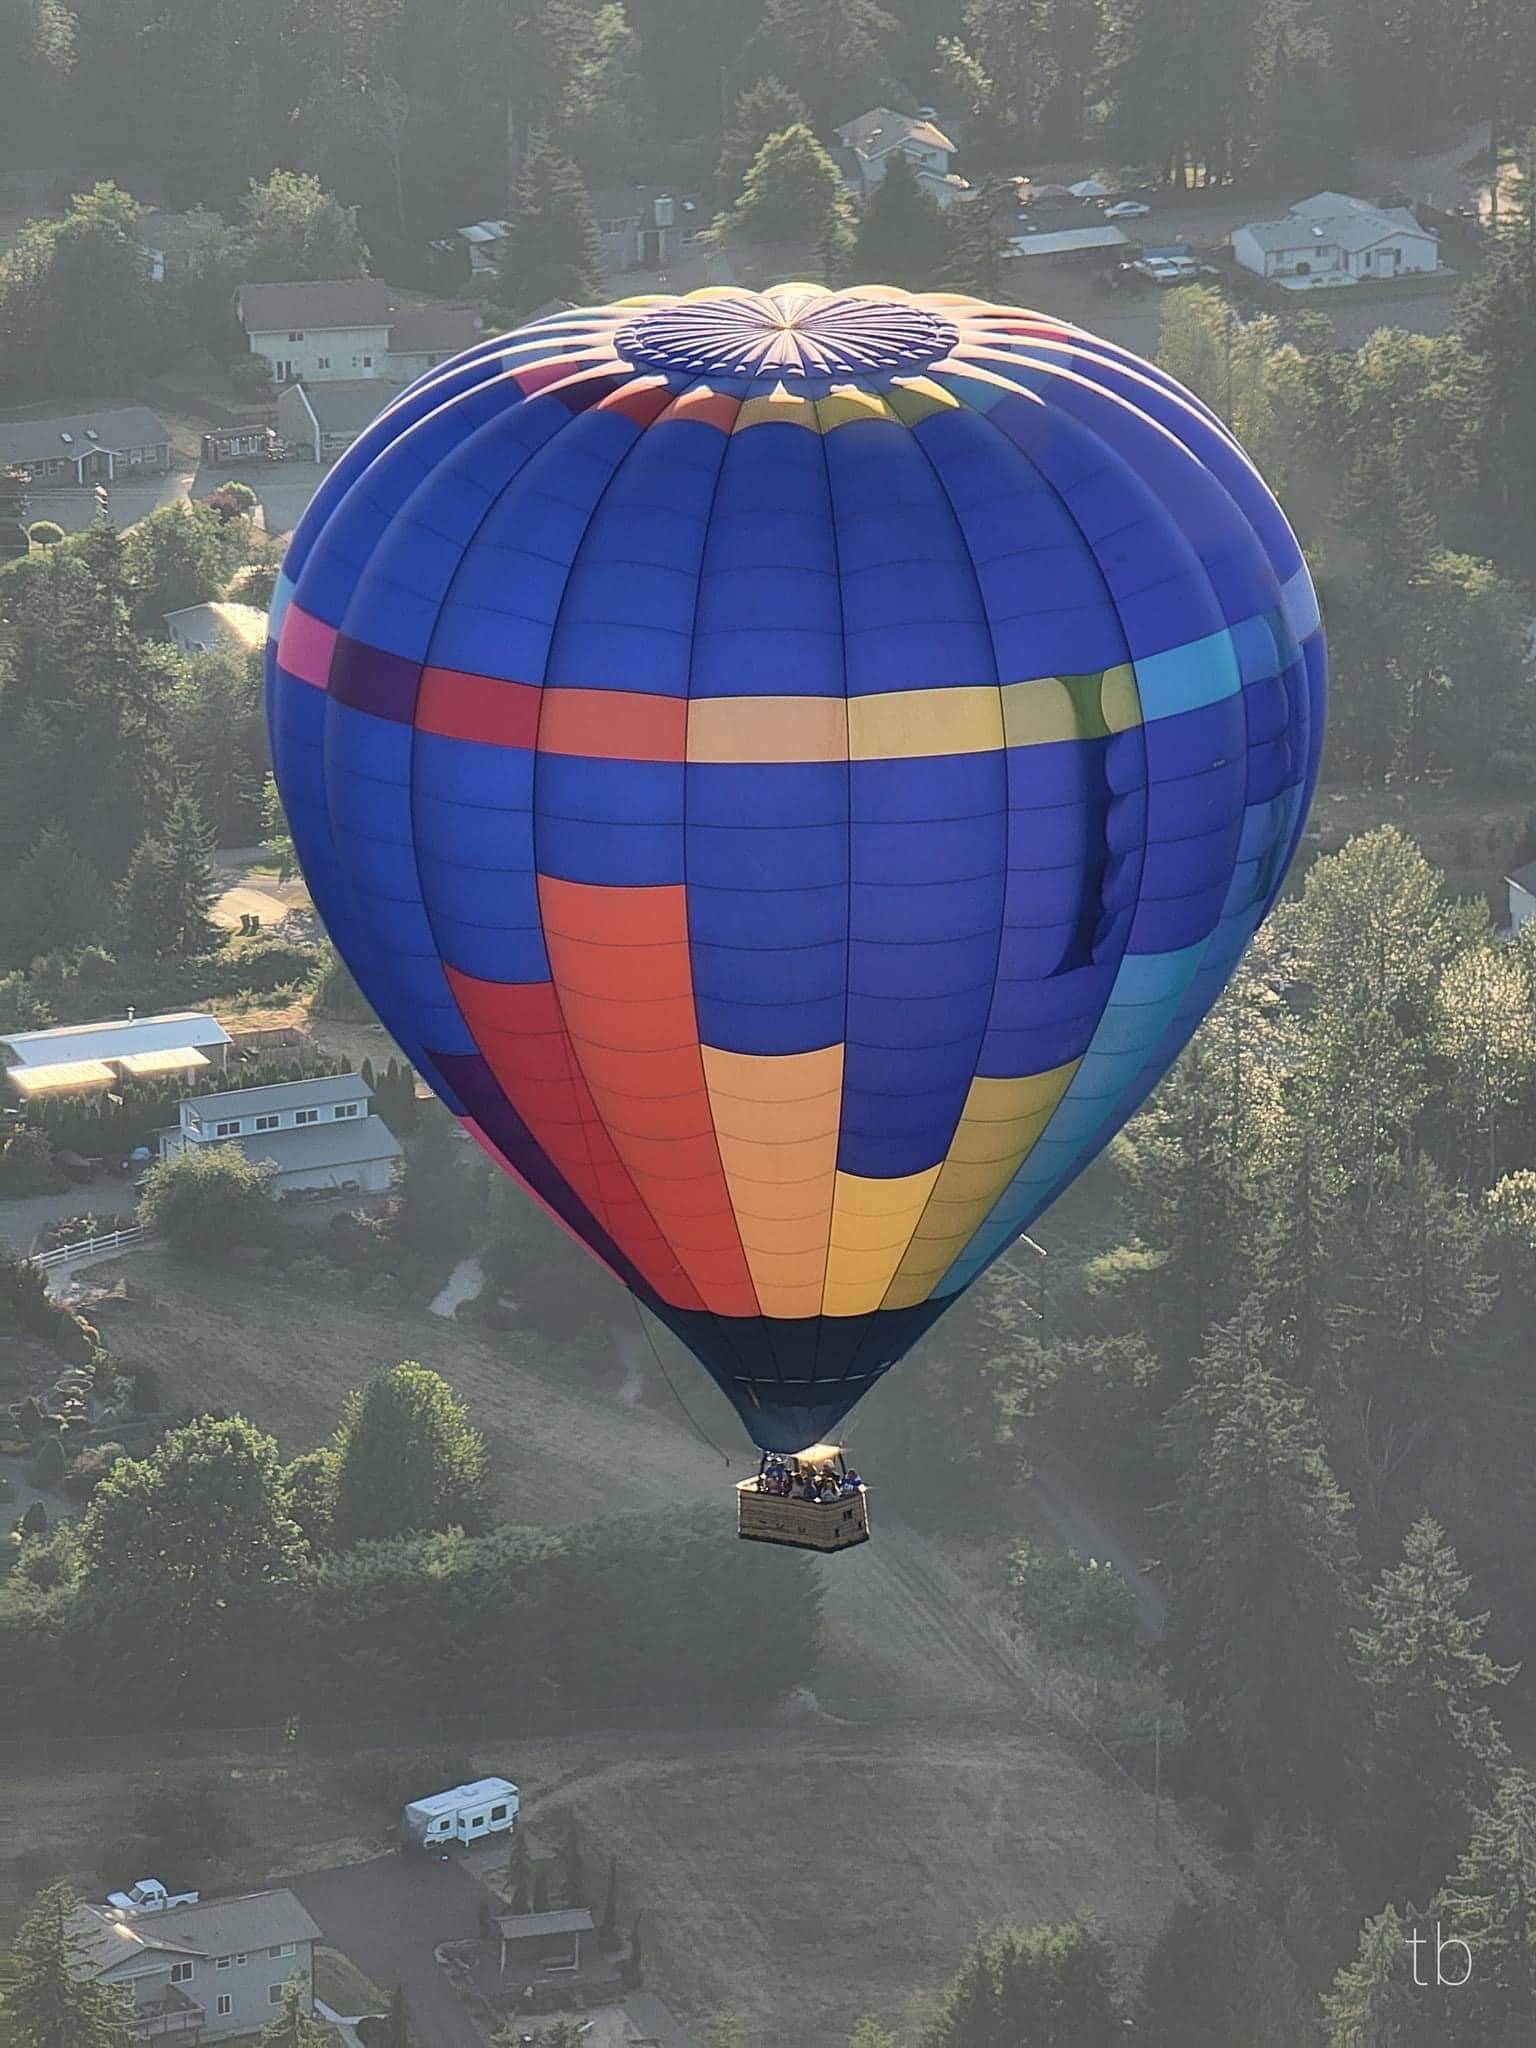 UFO and hot air balloon